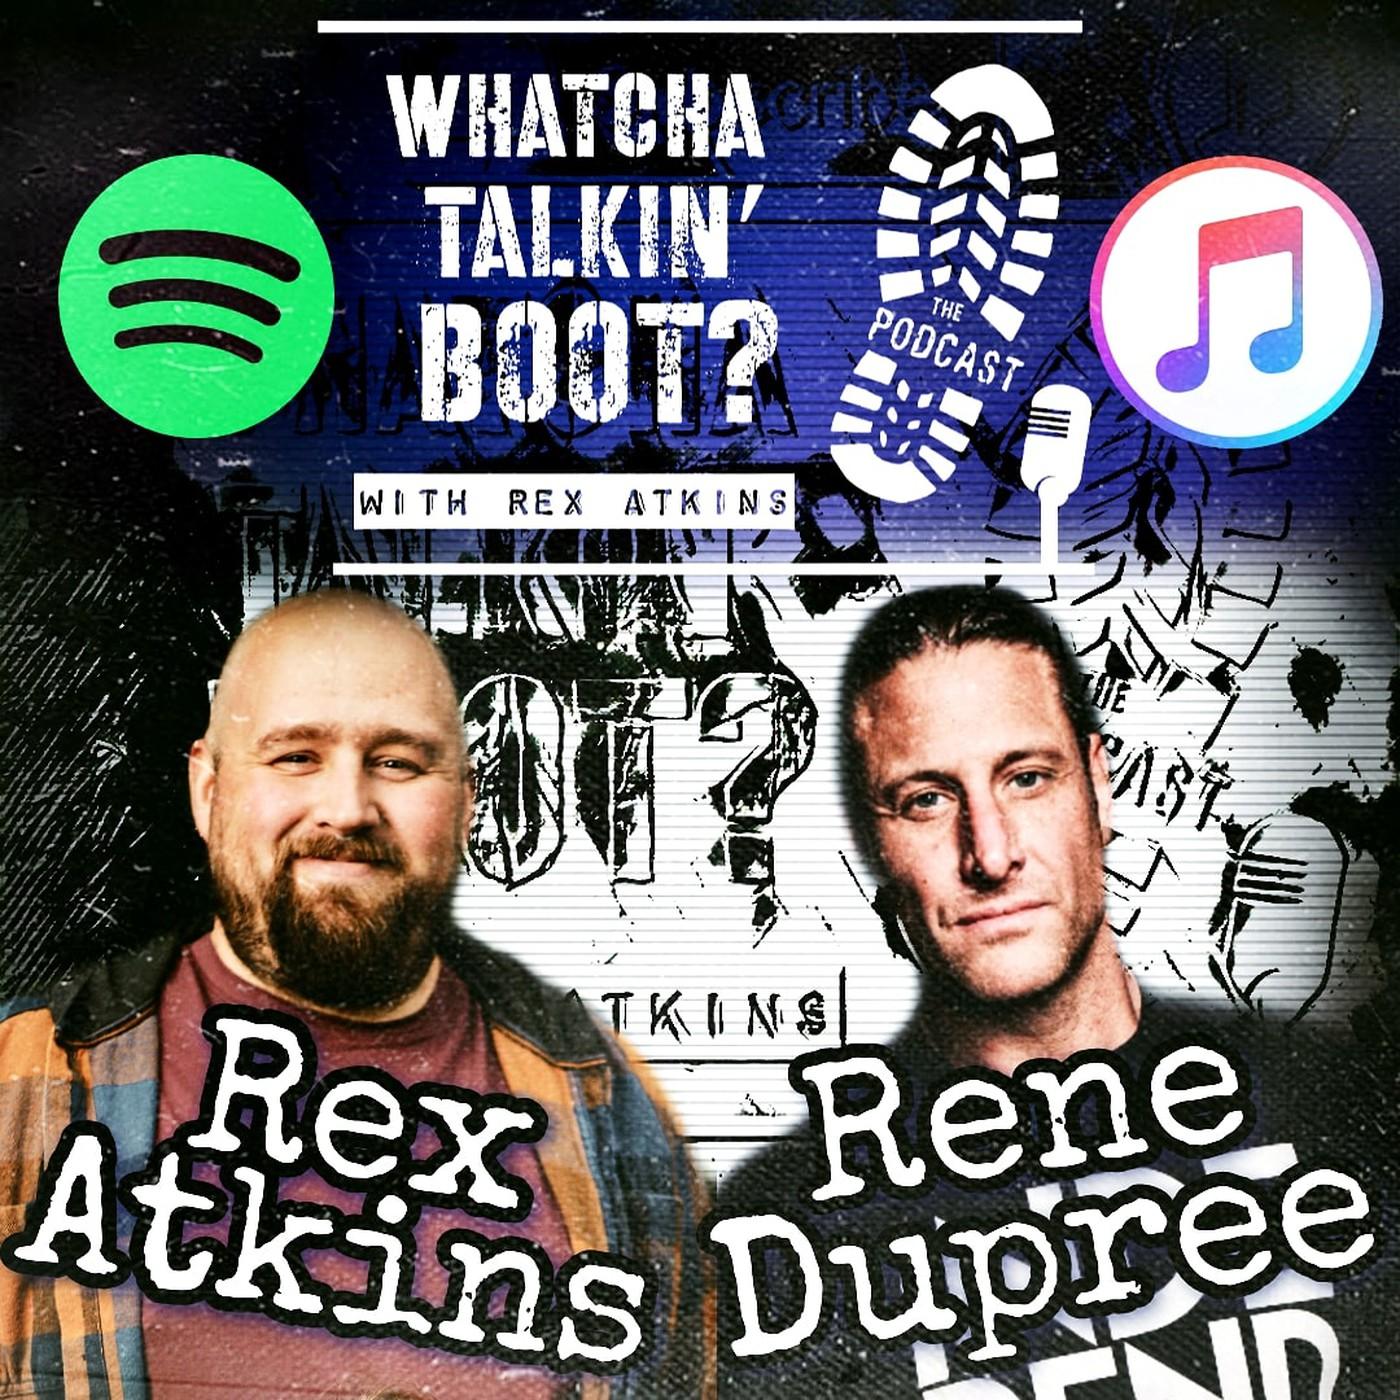 Whatcha Talkin' Boot